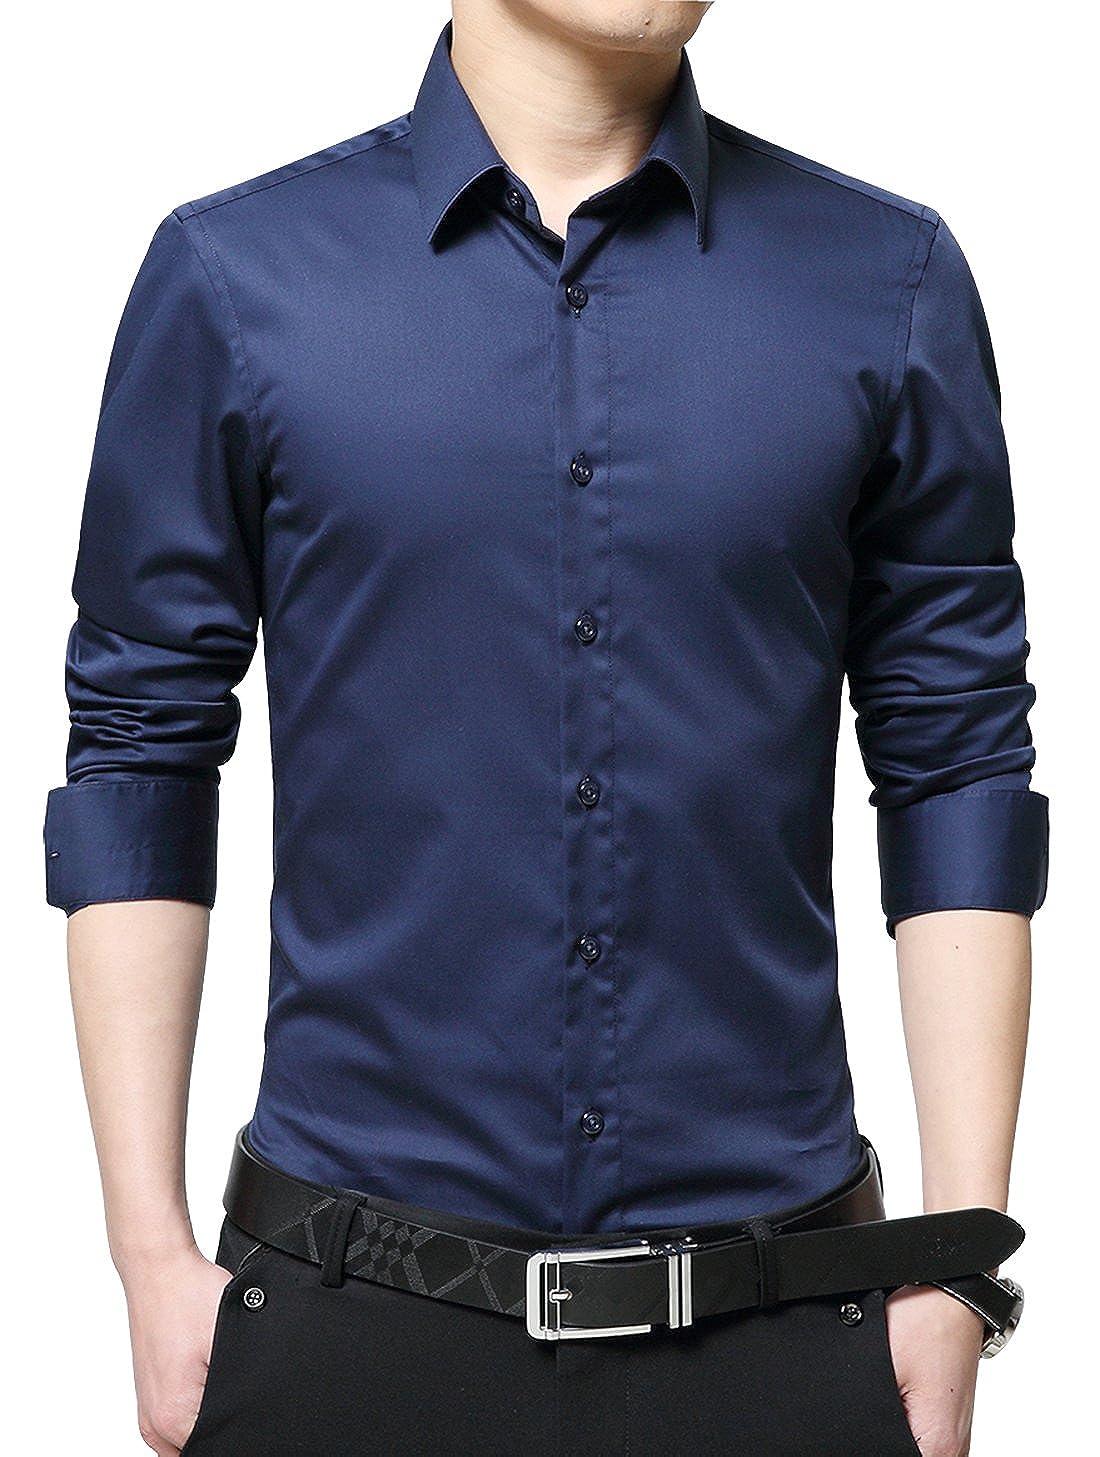 XTAPAN Men's Long Sleeve Casual Slim Fit Business Button Down Dress Shirt